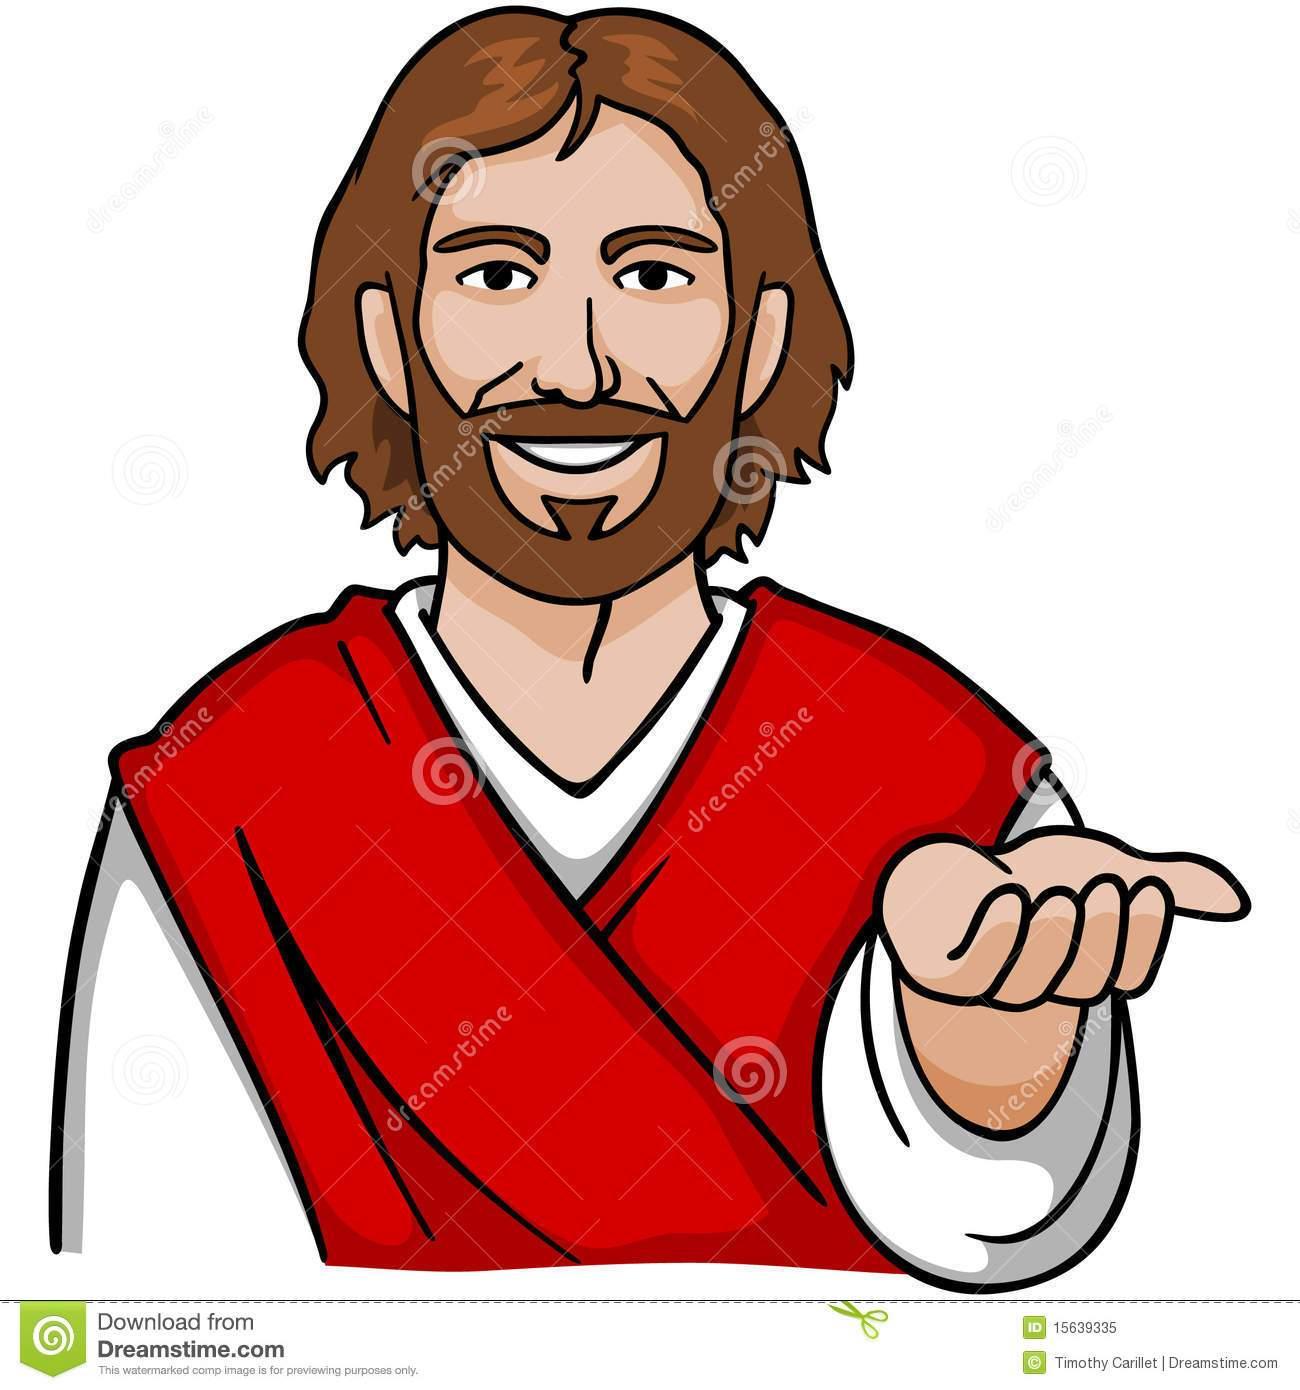 Jesus clipart free download » Clipart Portal.